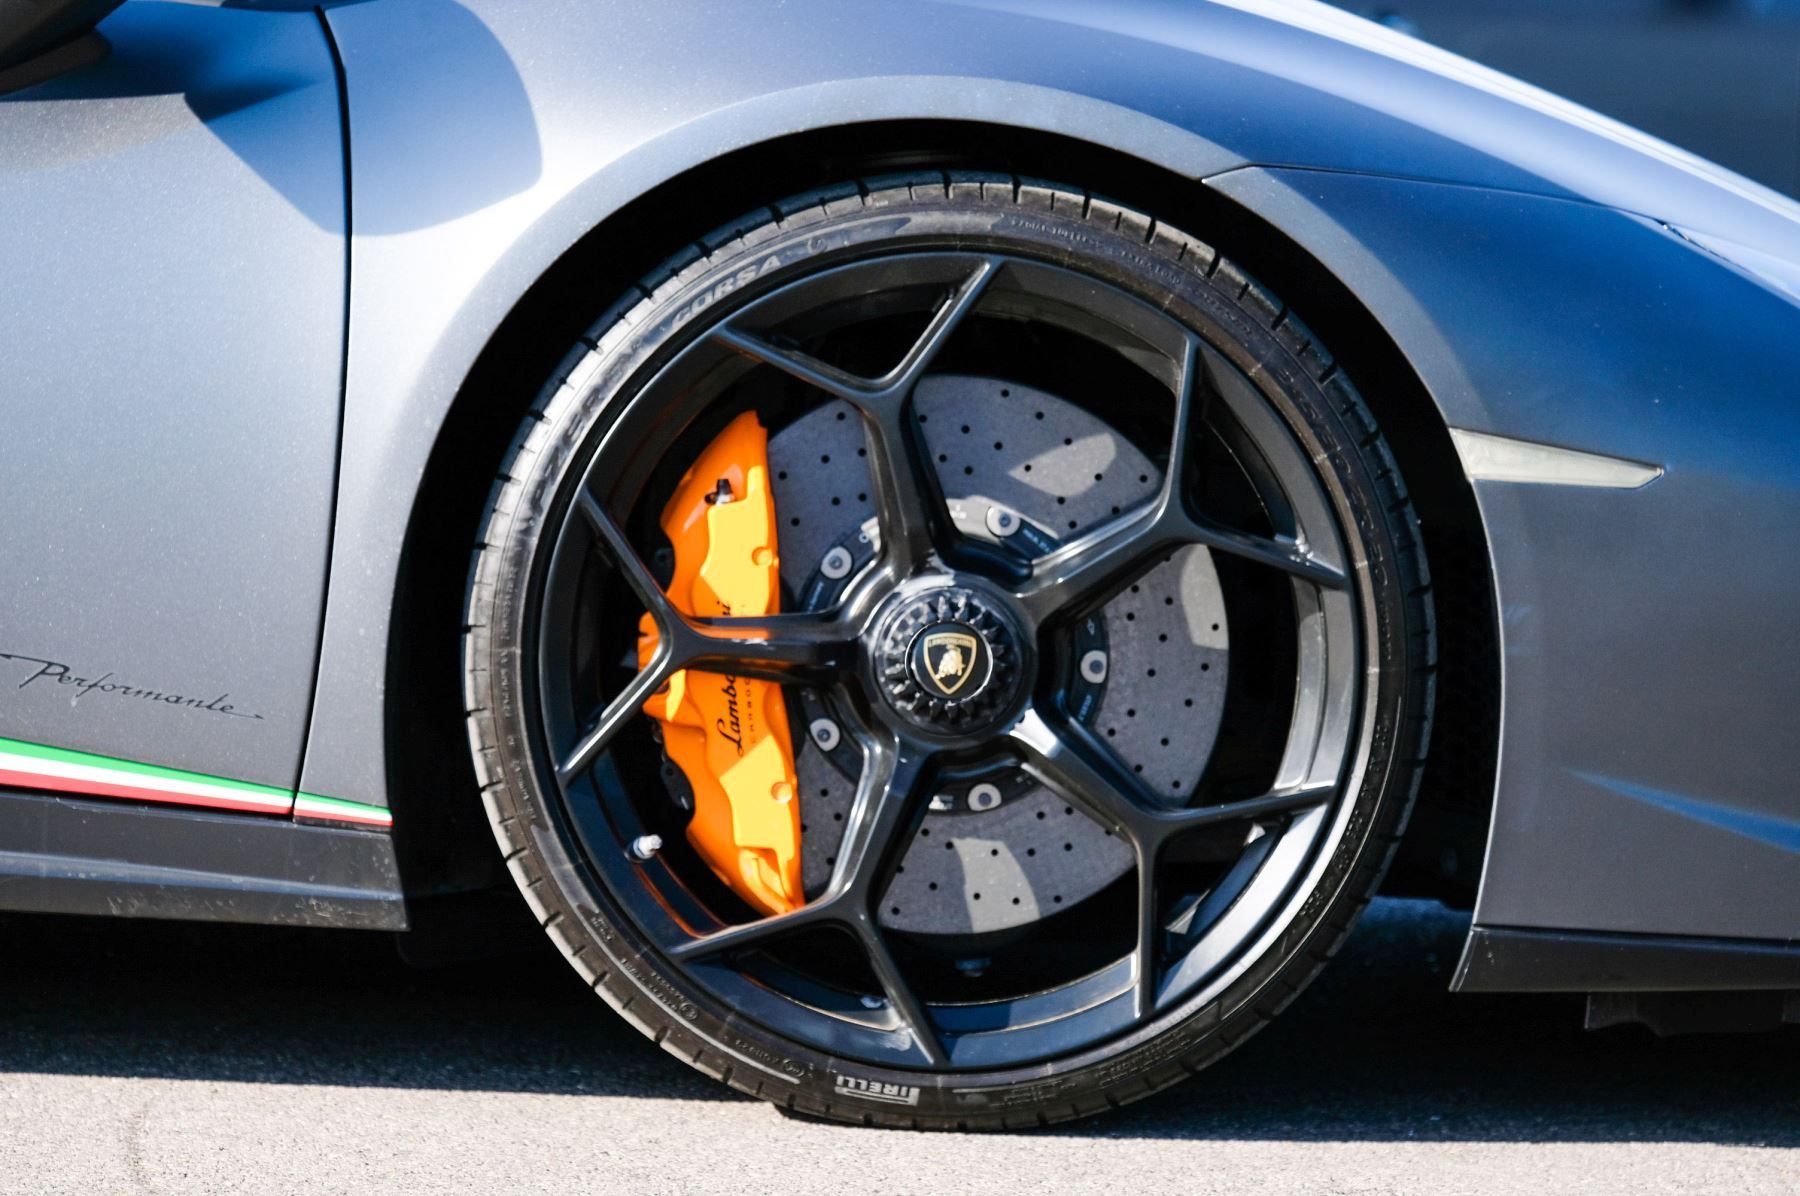 Lamborghini Huracan Performante LP 640-4 2dr LDF - Carbon Ceramic Brakes - Carbon Fiber Features - Comfort Seats image 9